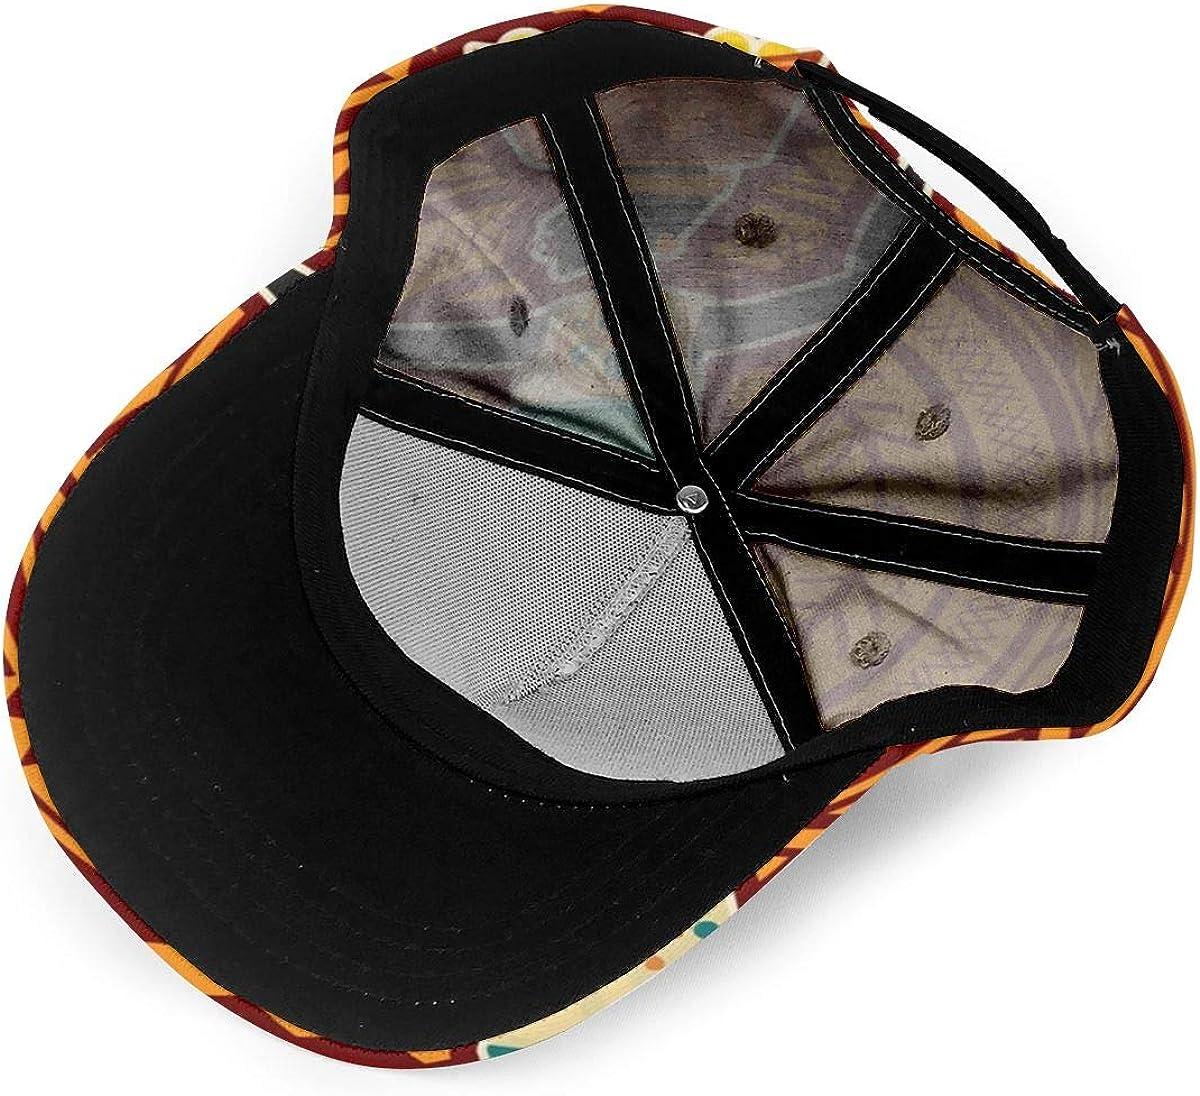 Ethnic Dress African Women Fashion Classic Full Print Visor Hat Adjustable Baseball Cap